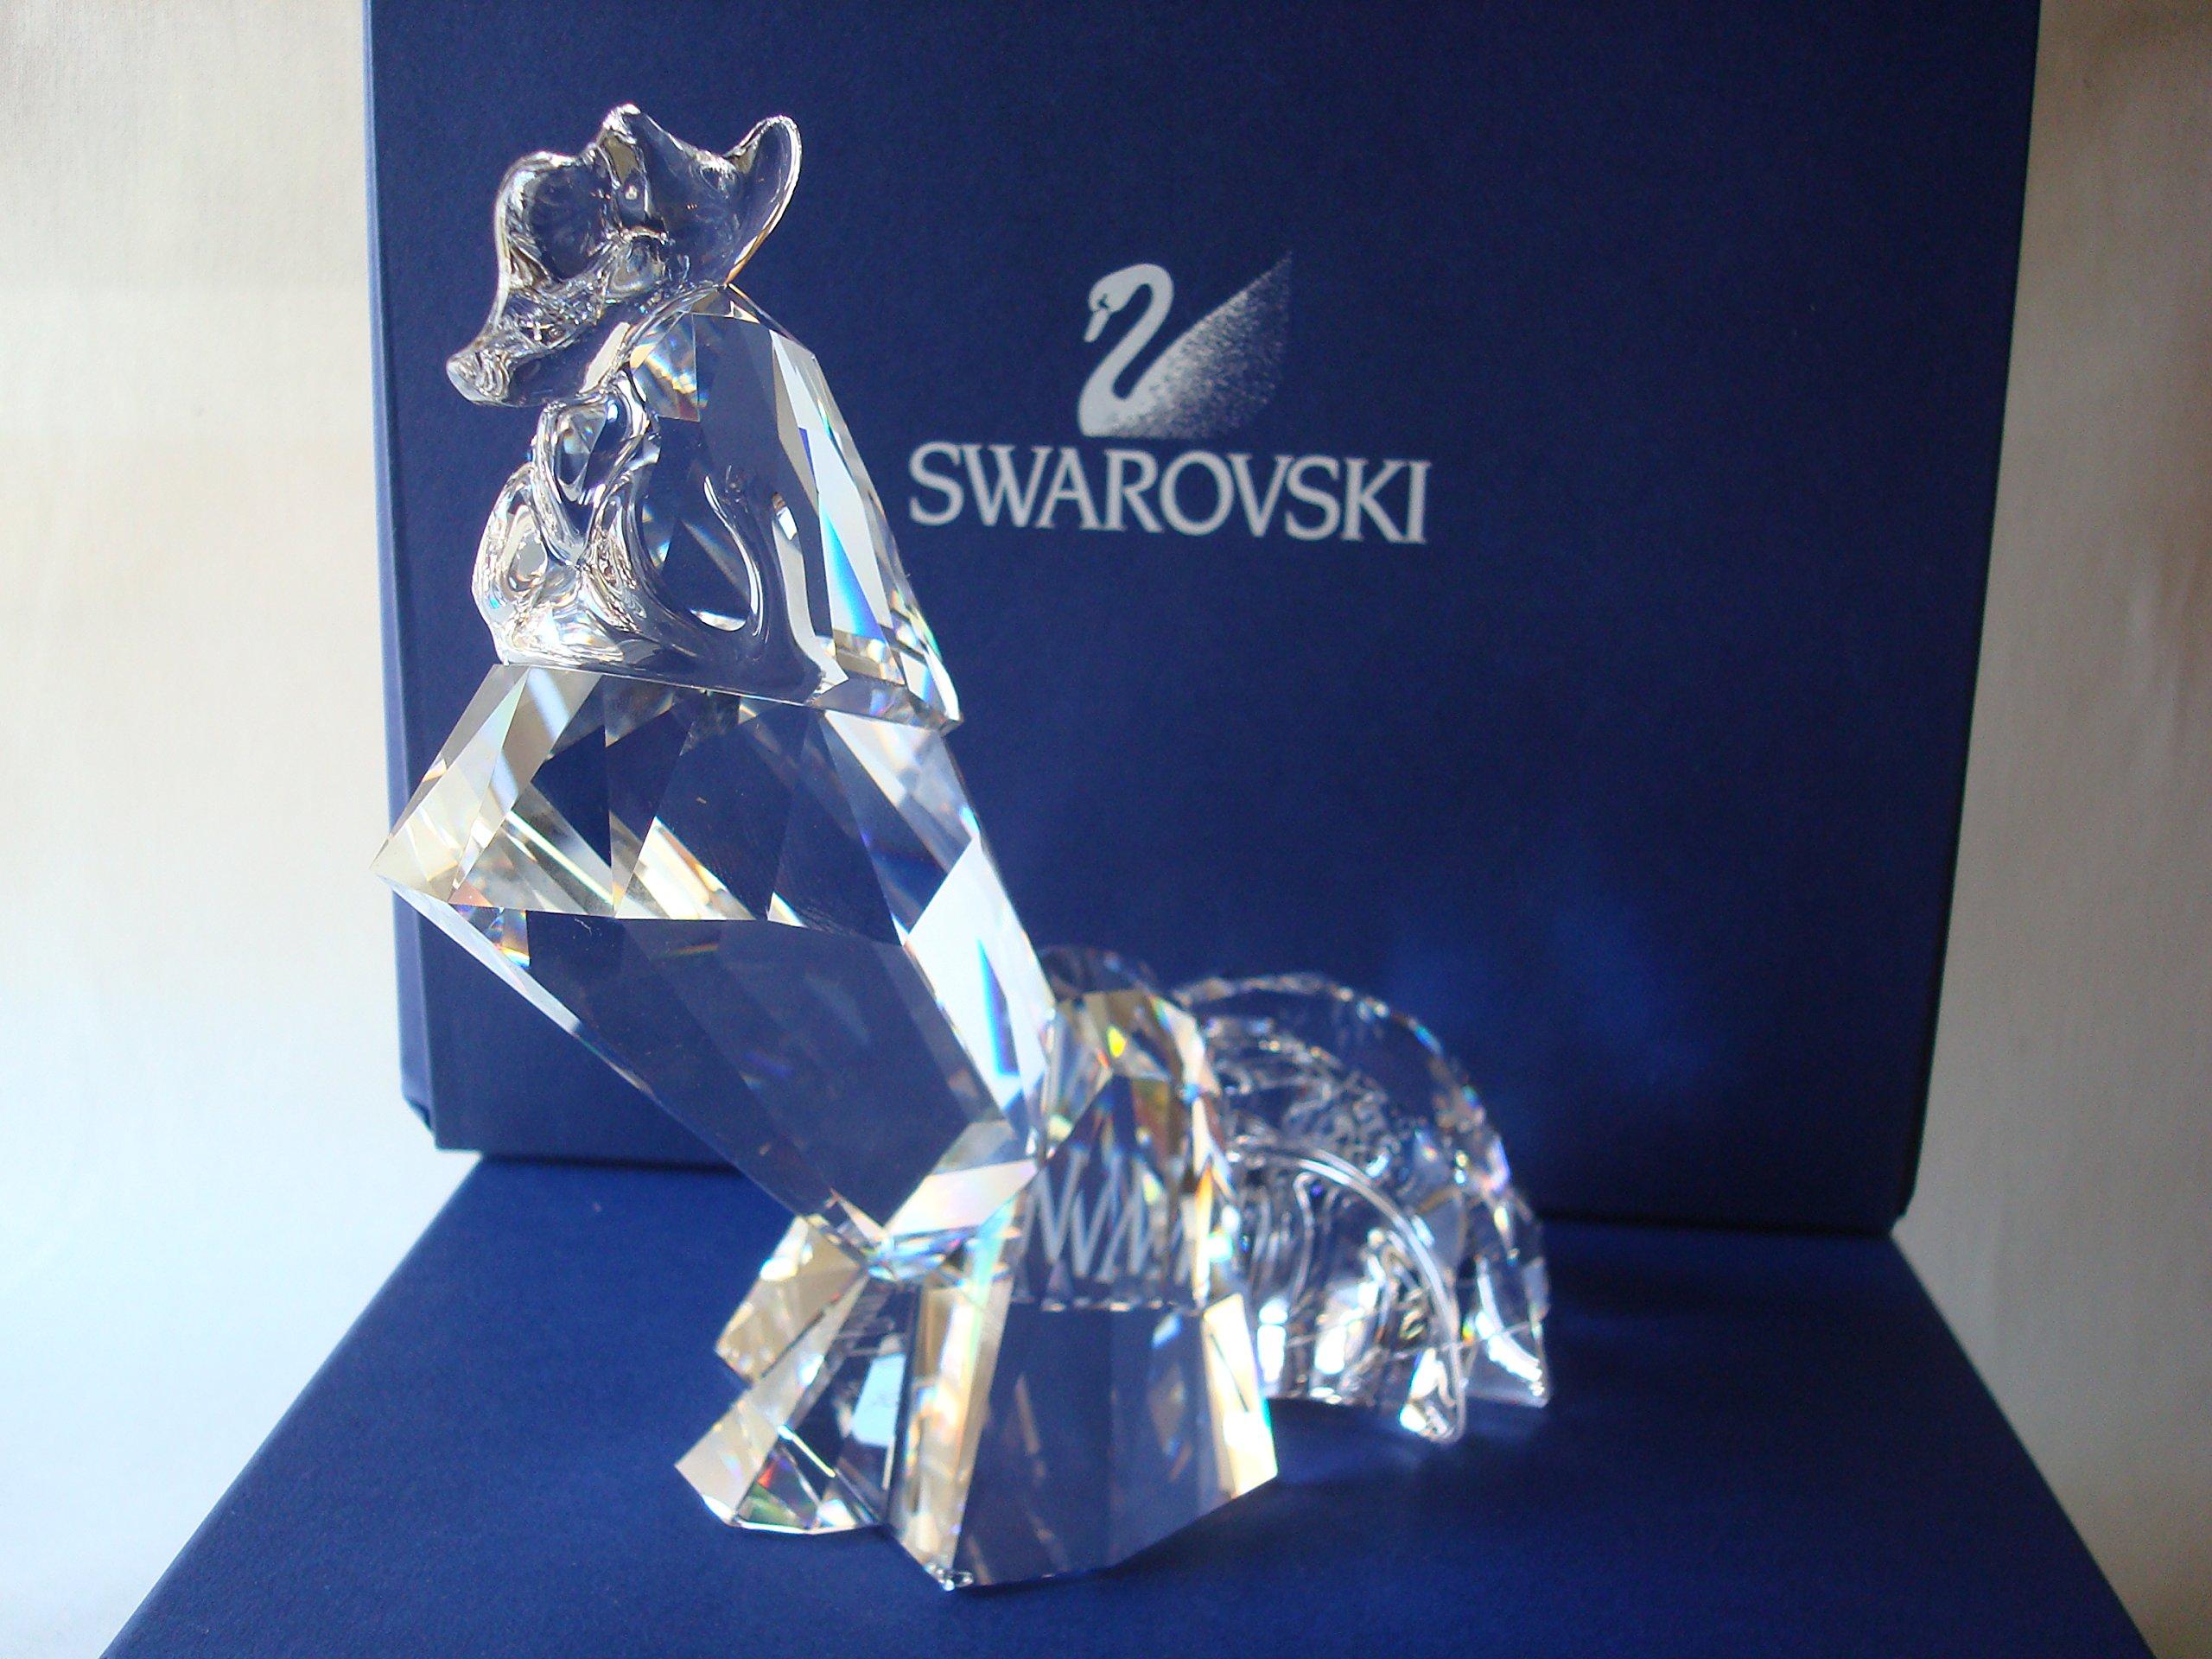 Swarovski the Rooster by Swarovksi